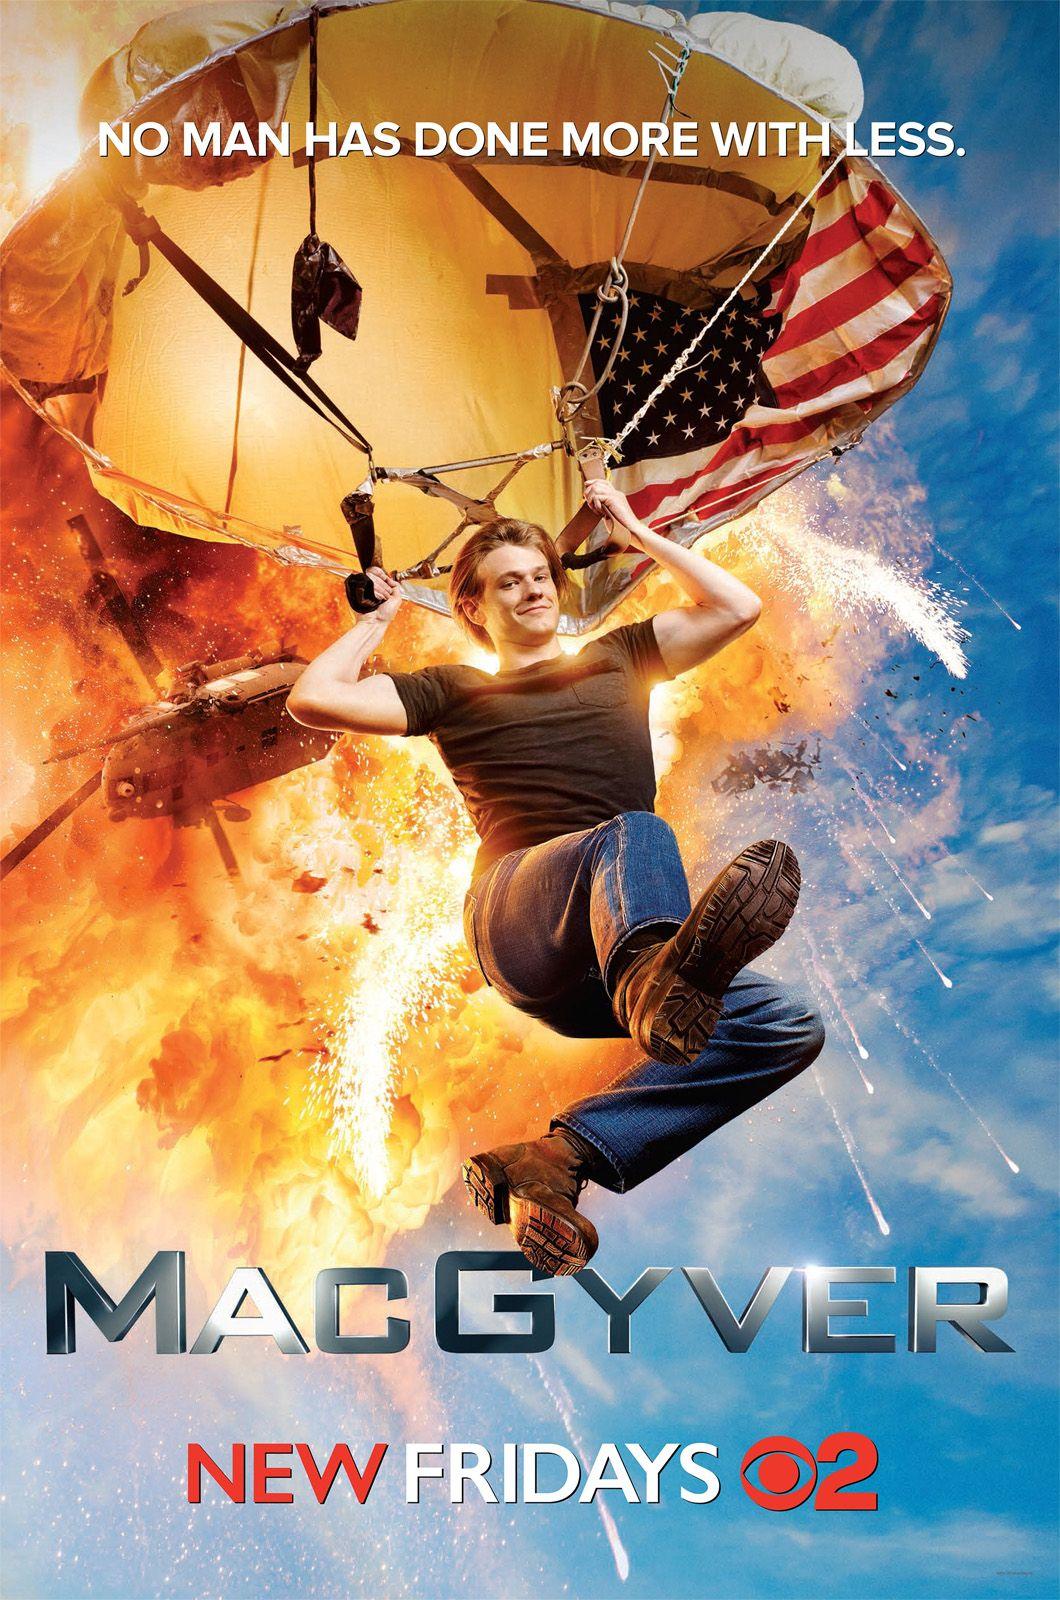 MacGyver (T1, 22 ep.)